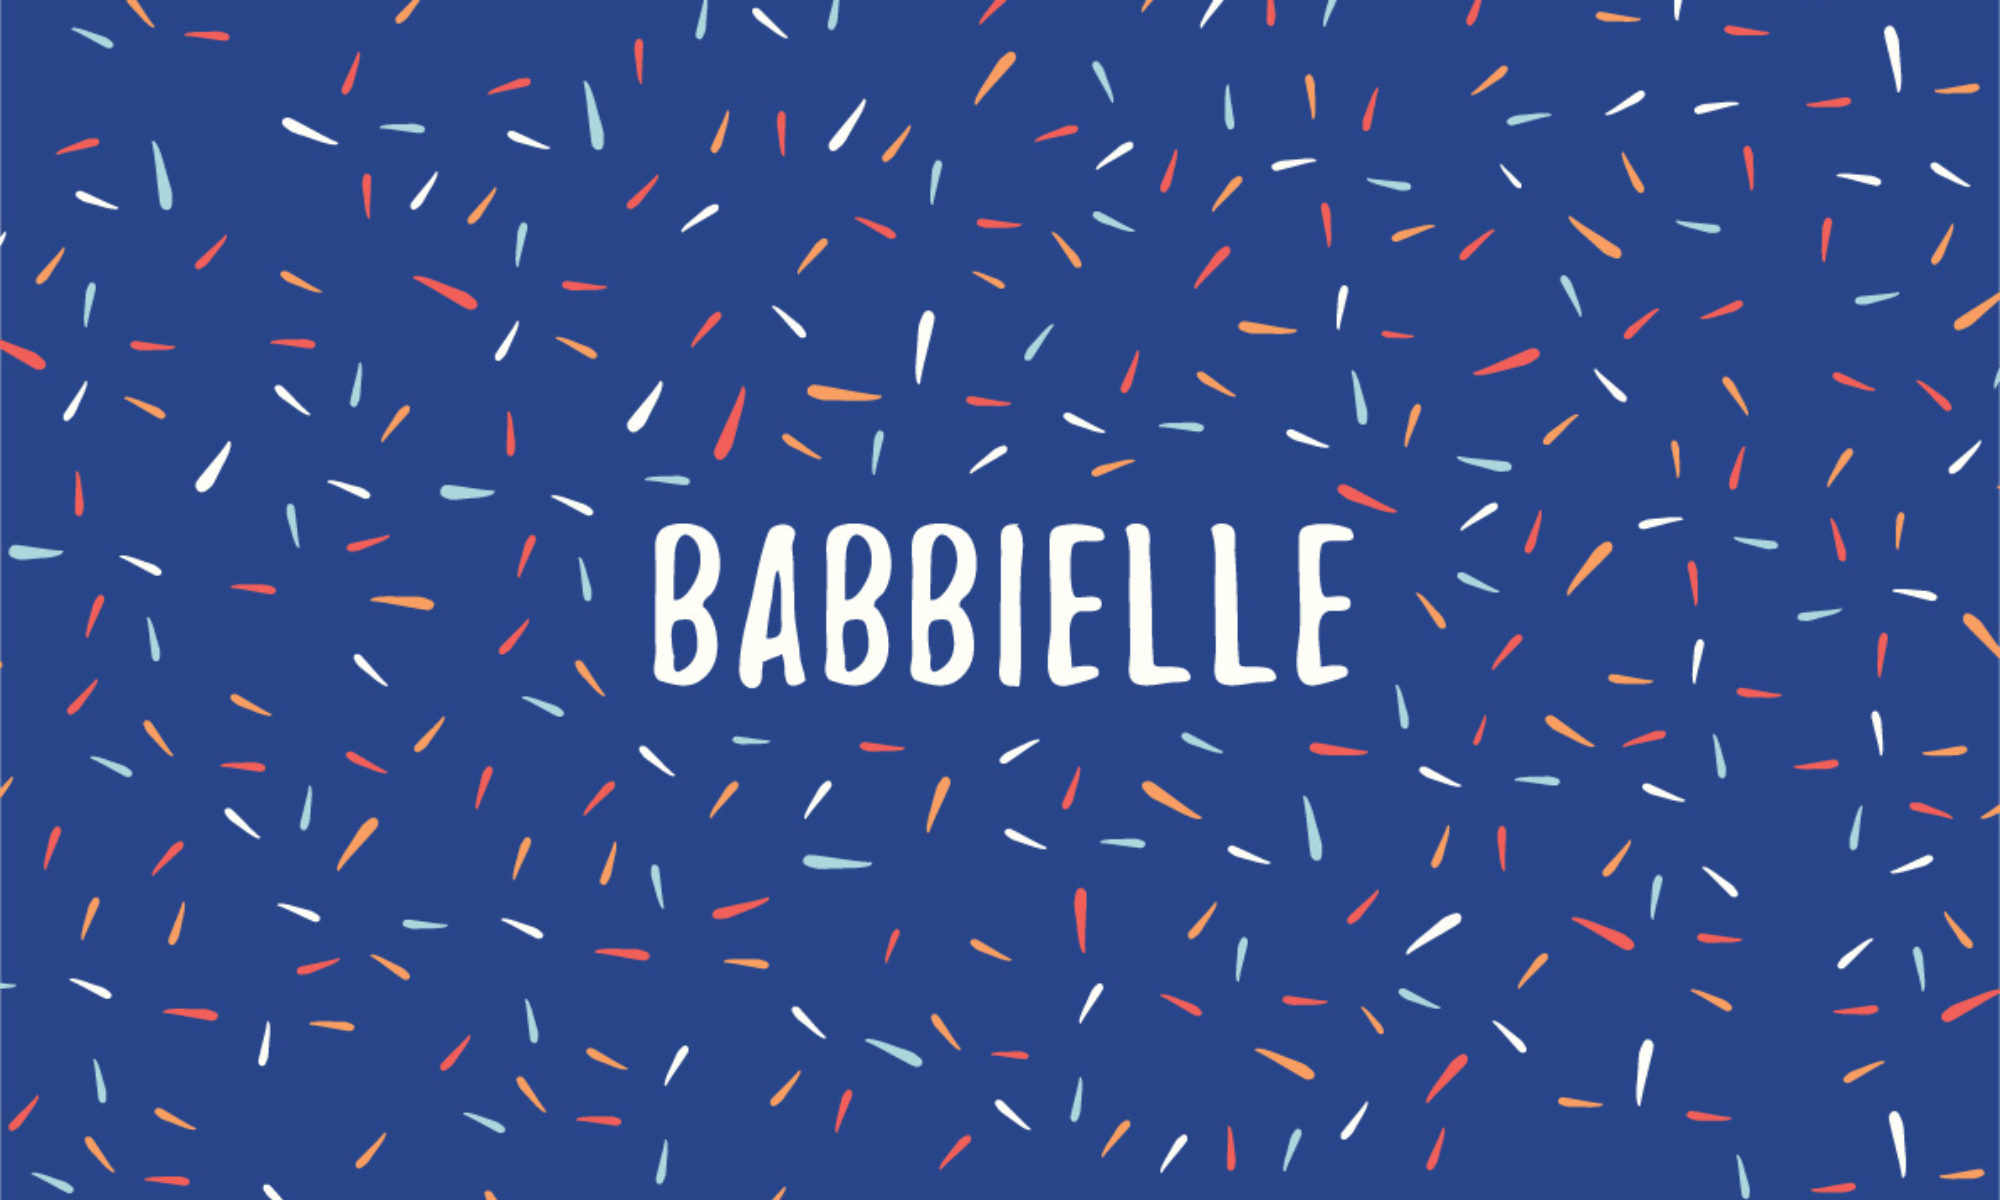 Babbielle